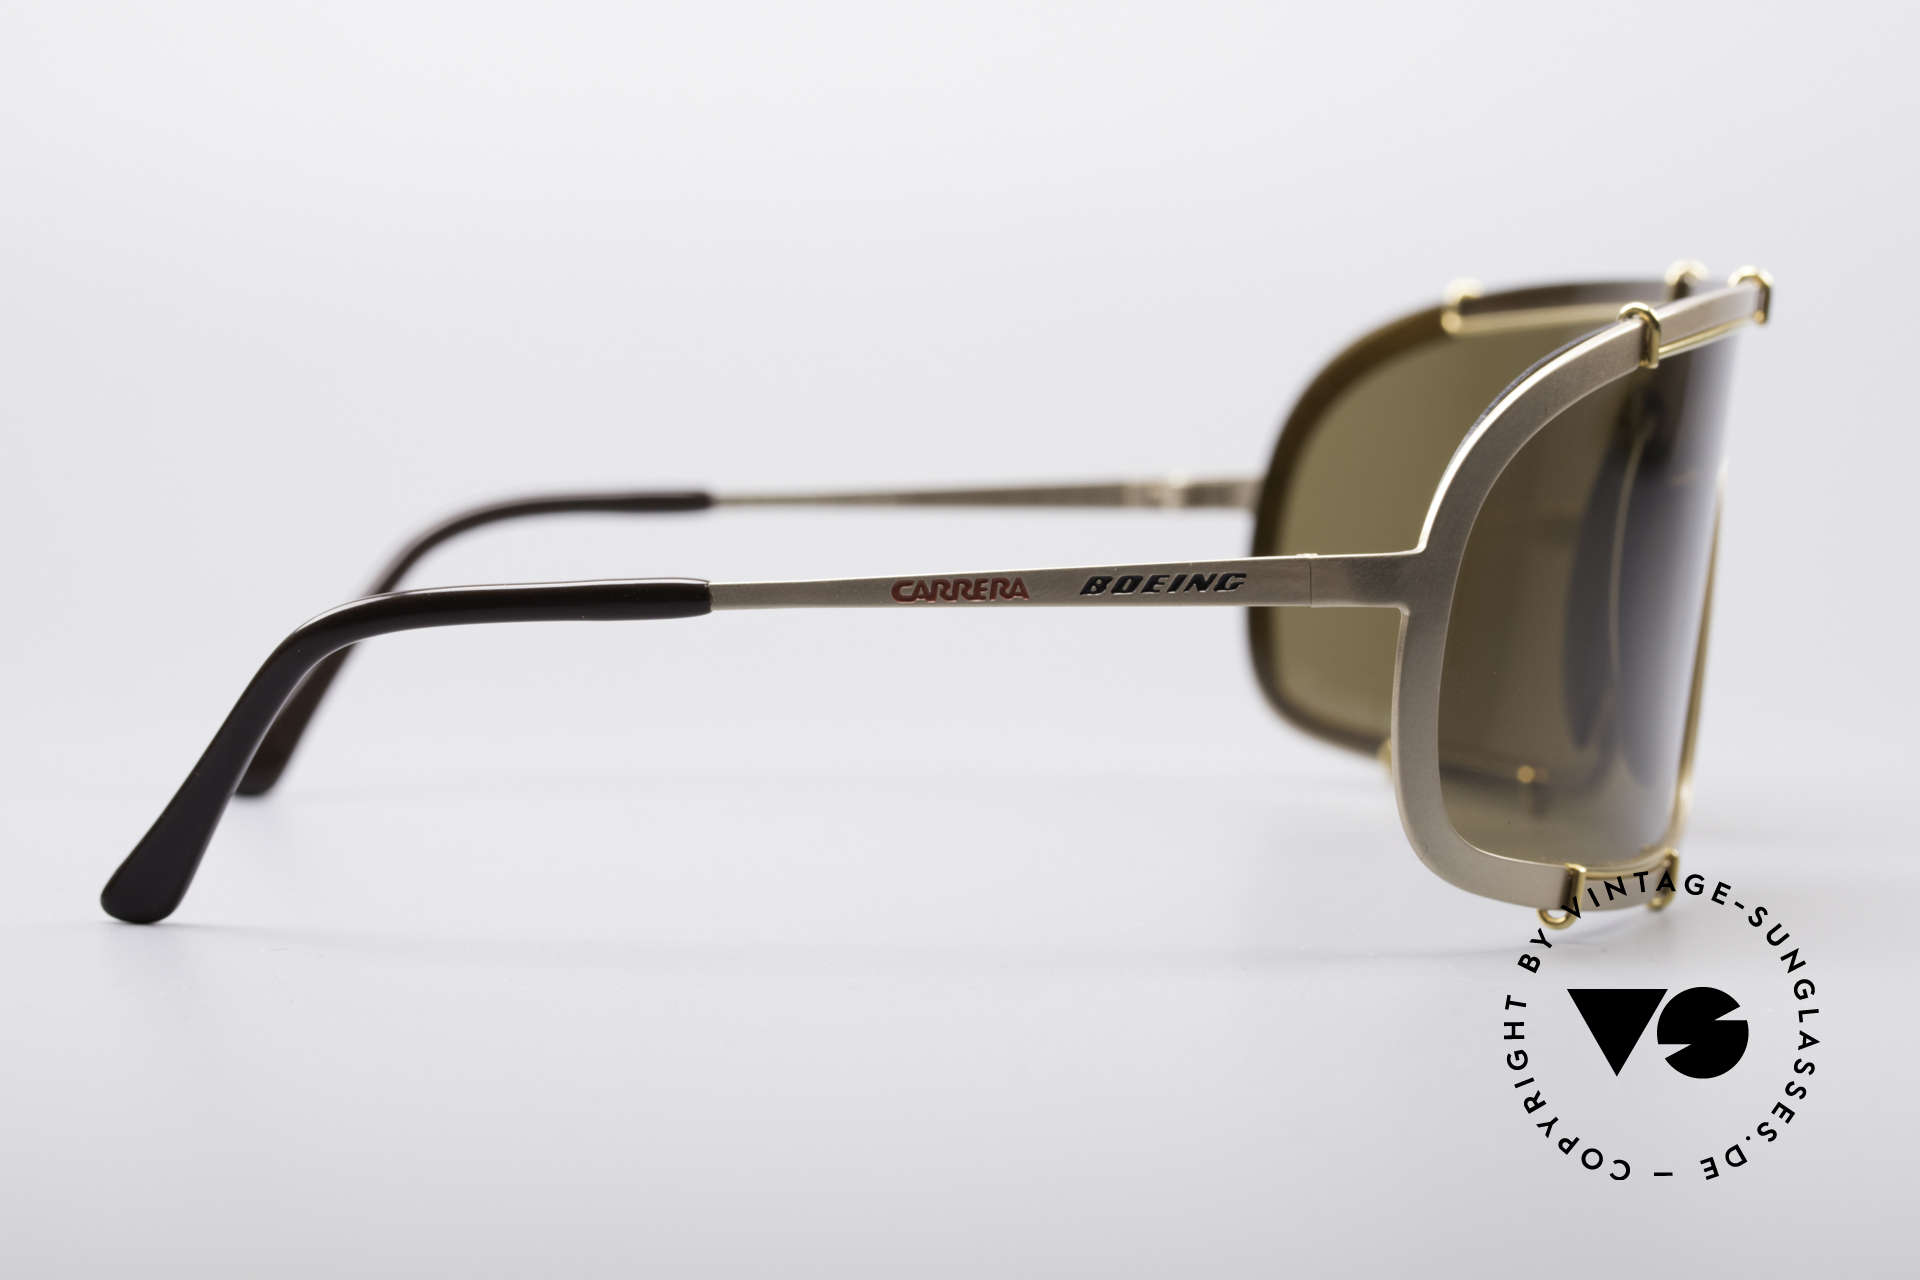 Boeing 5708 80's Luxury Pilots Shades, unworn vintage vertu (comes with a Cavalli hard case), Made for Men